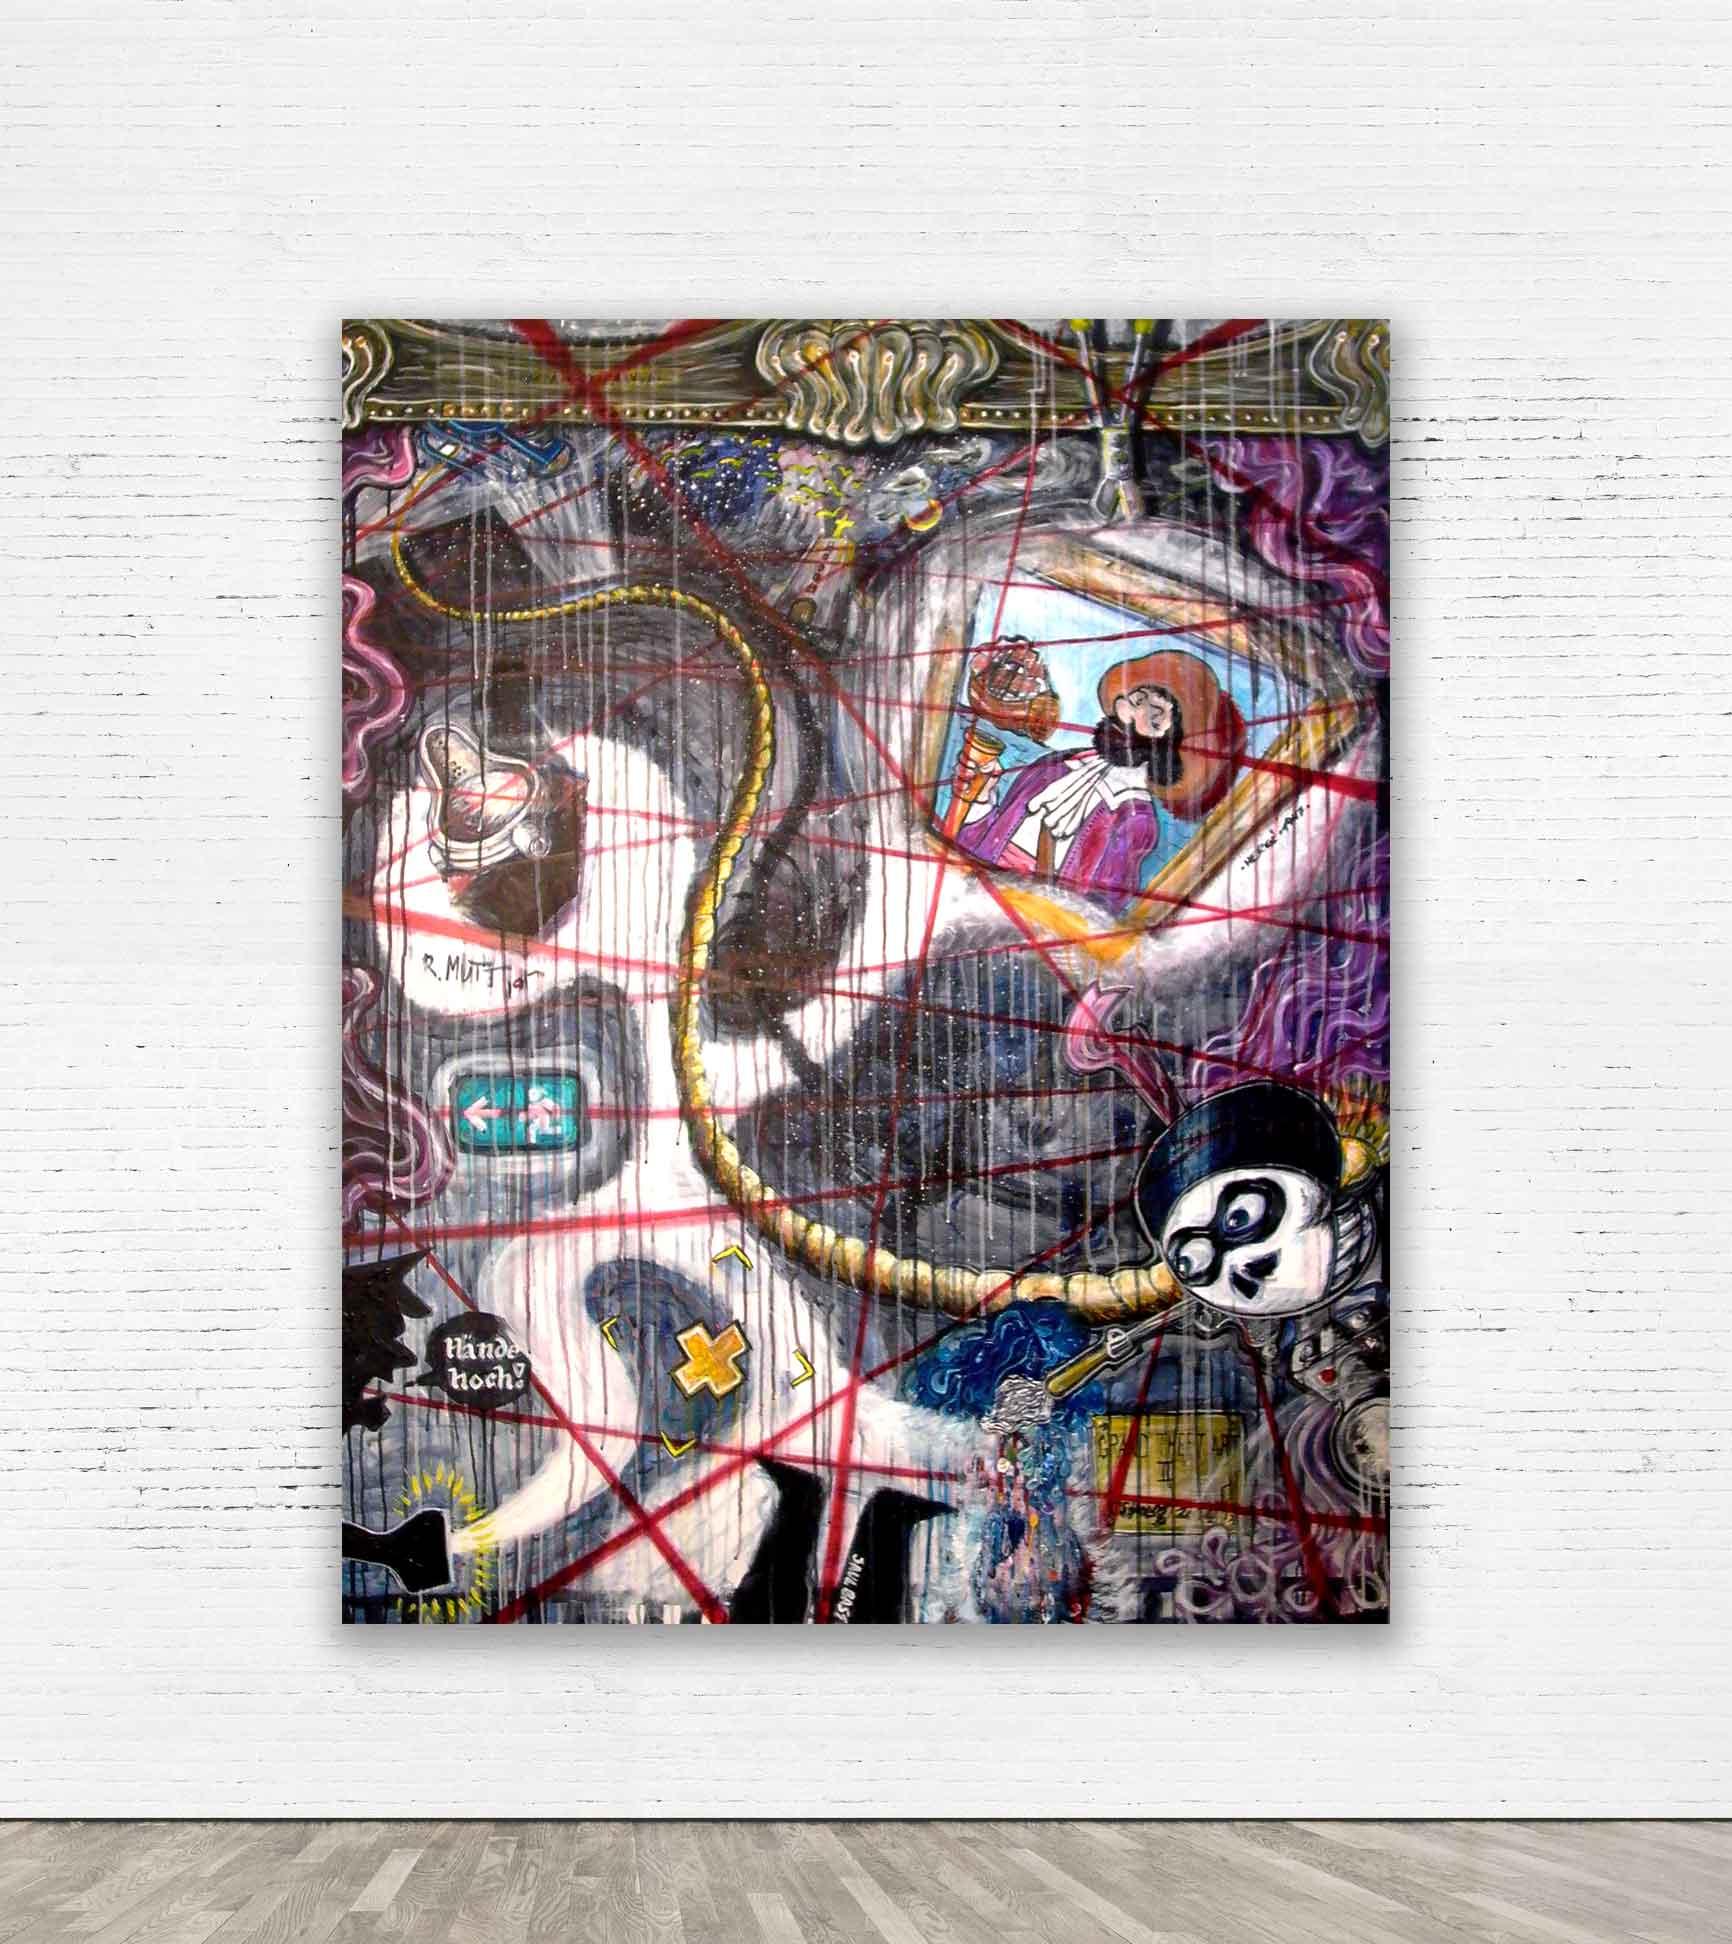 """GRAND THEFT ART II""  2009 Acrylic on canvas 120 x 160 cm   SOLD"